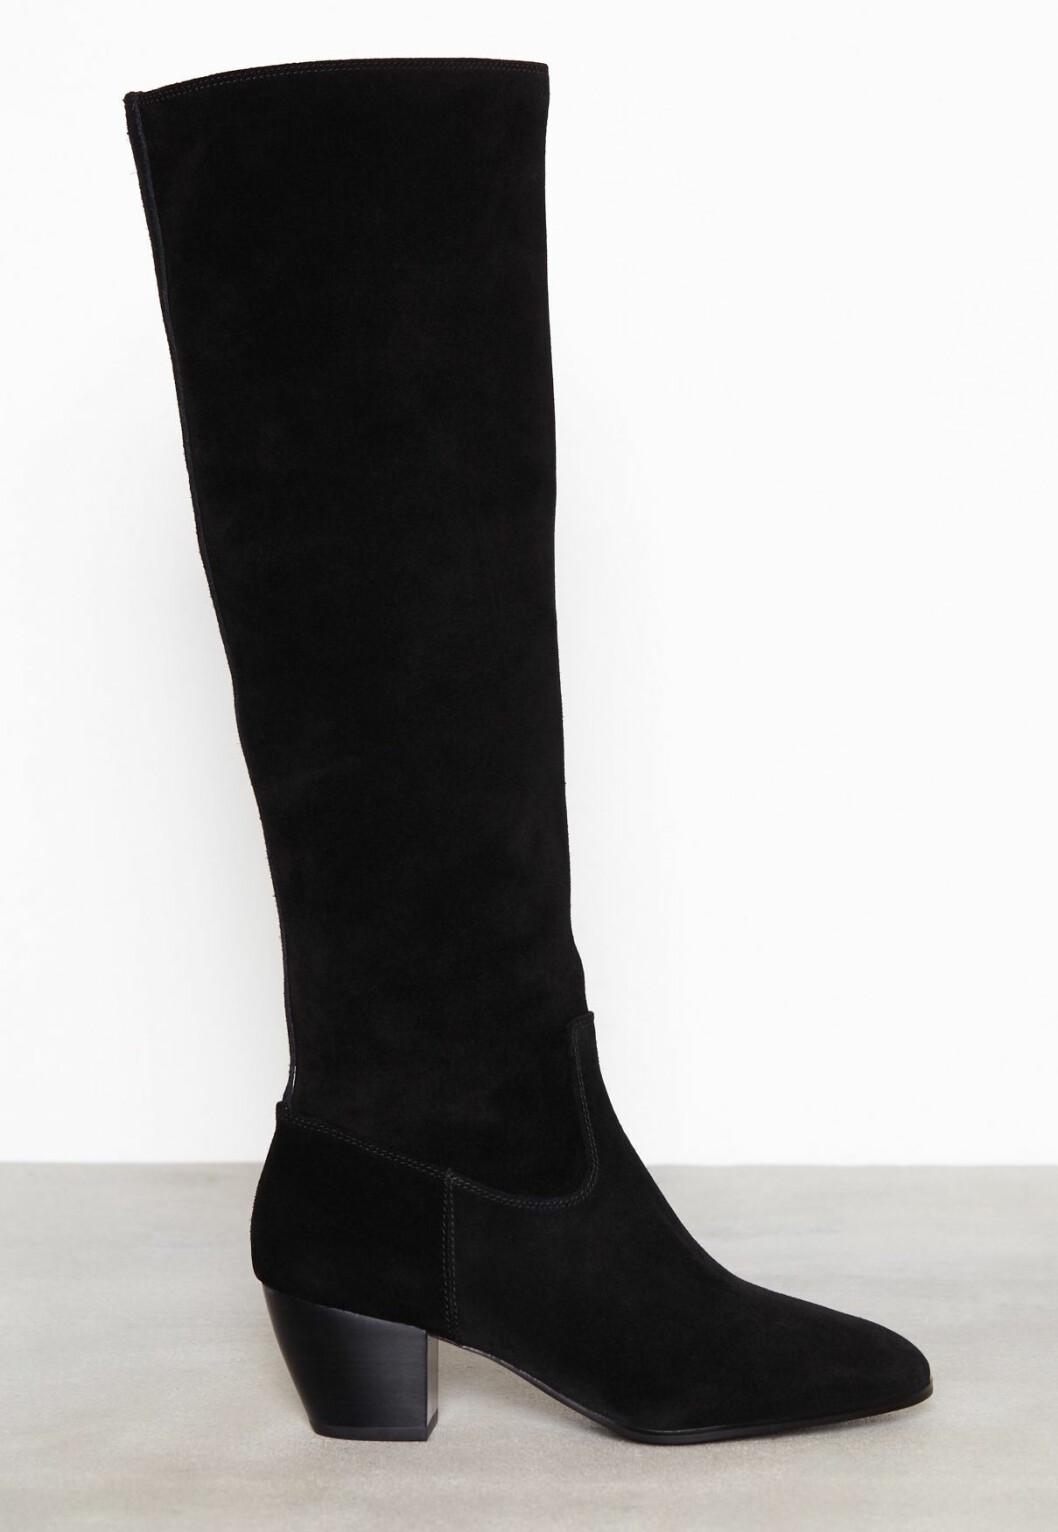 Svarta knähöga boots